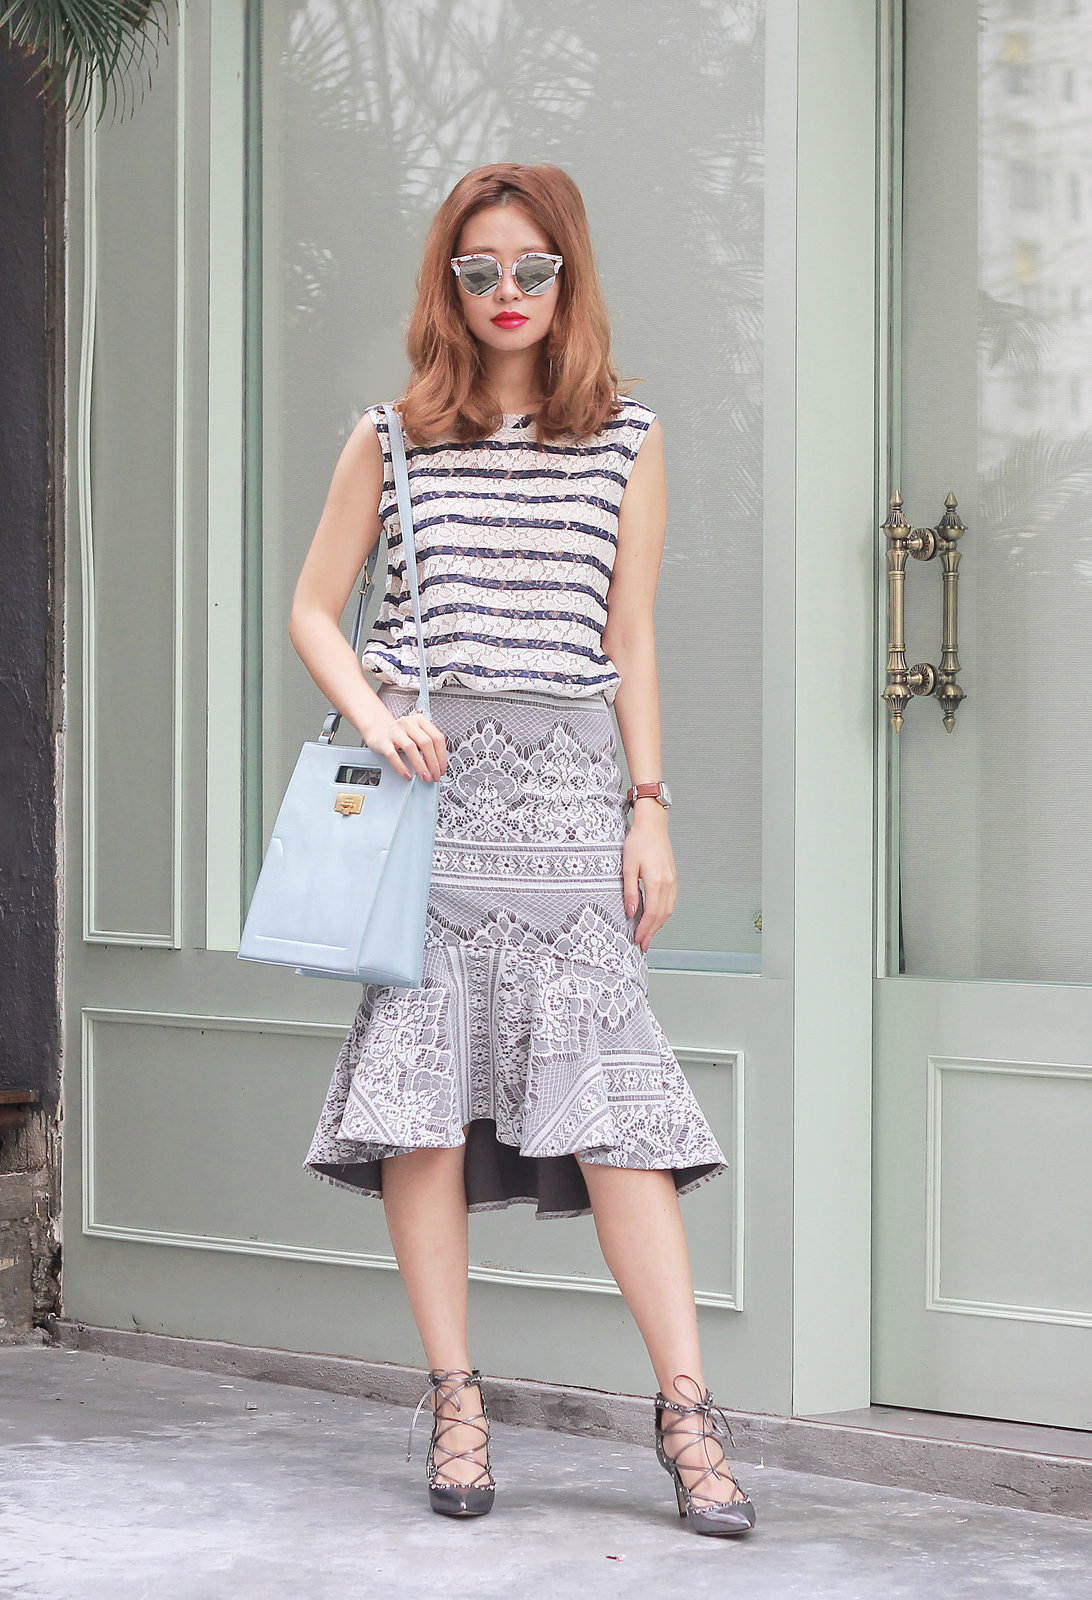 New style ideas fashion 14